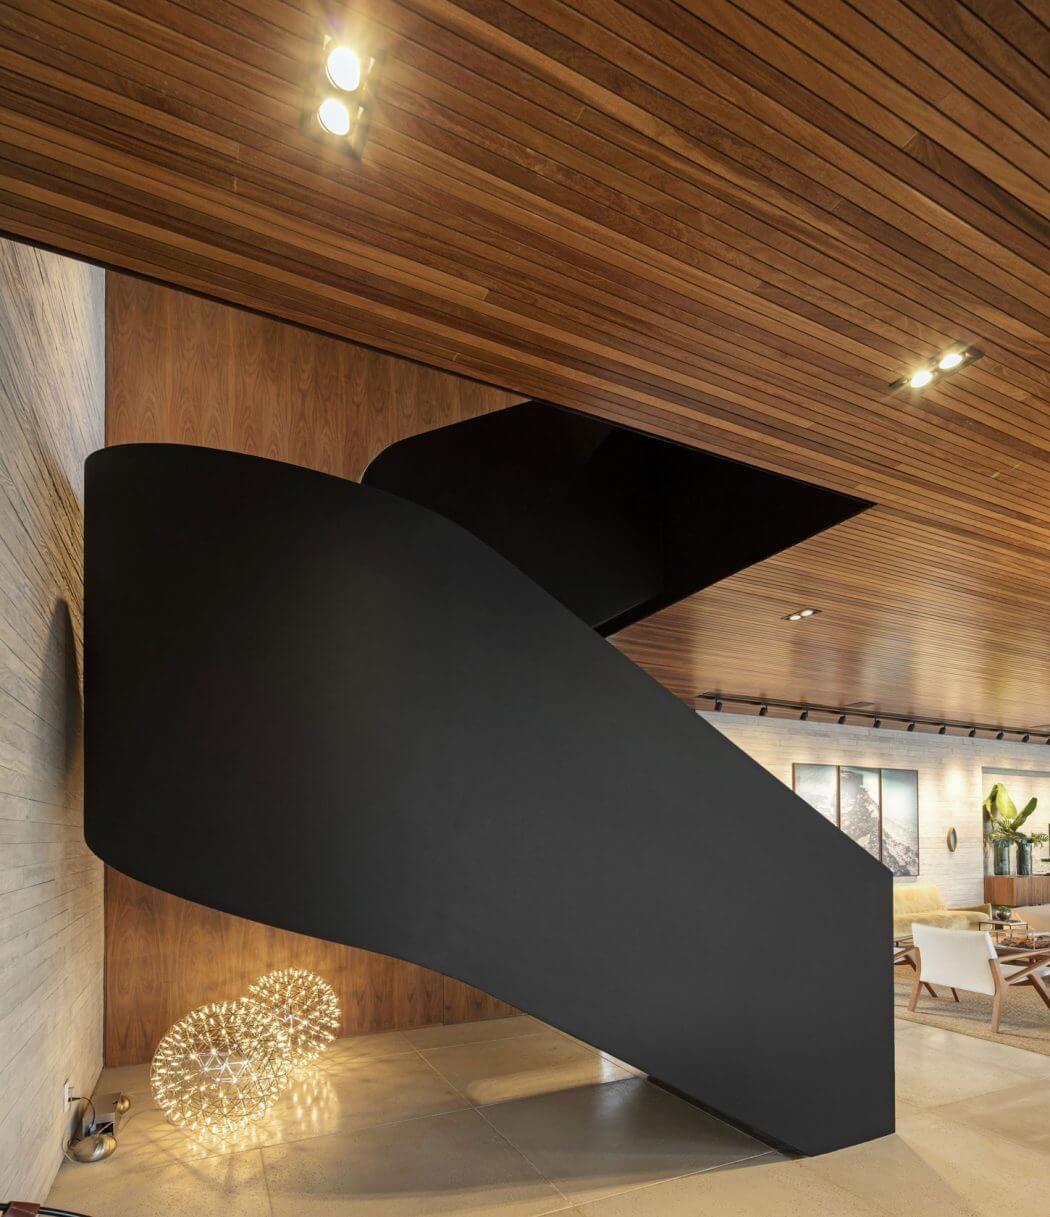 Inspirational Stairs Design: House In Porto Feliz By Fernanda Marques